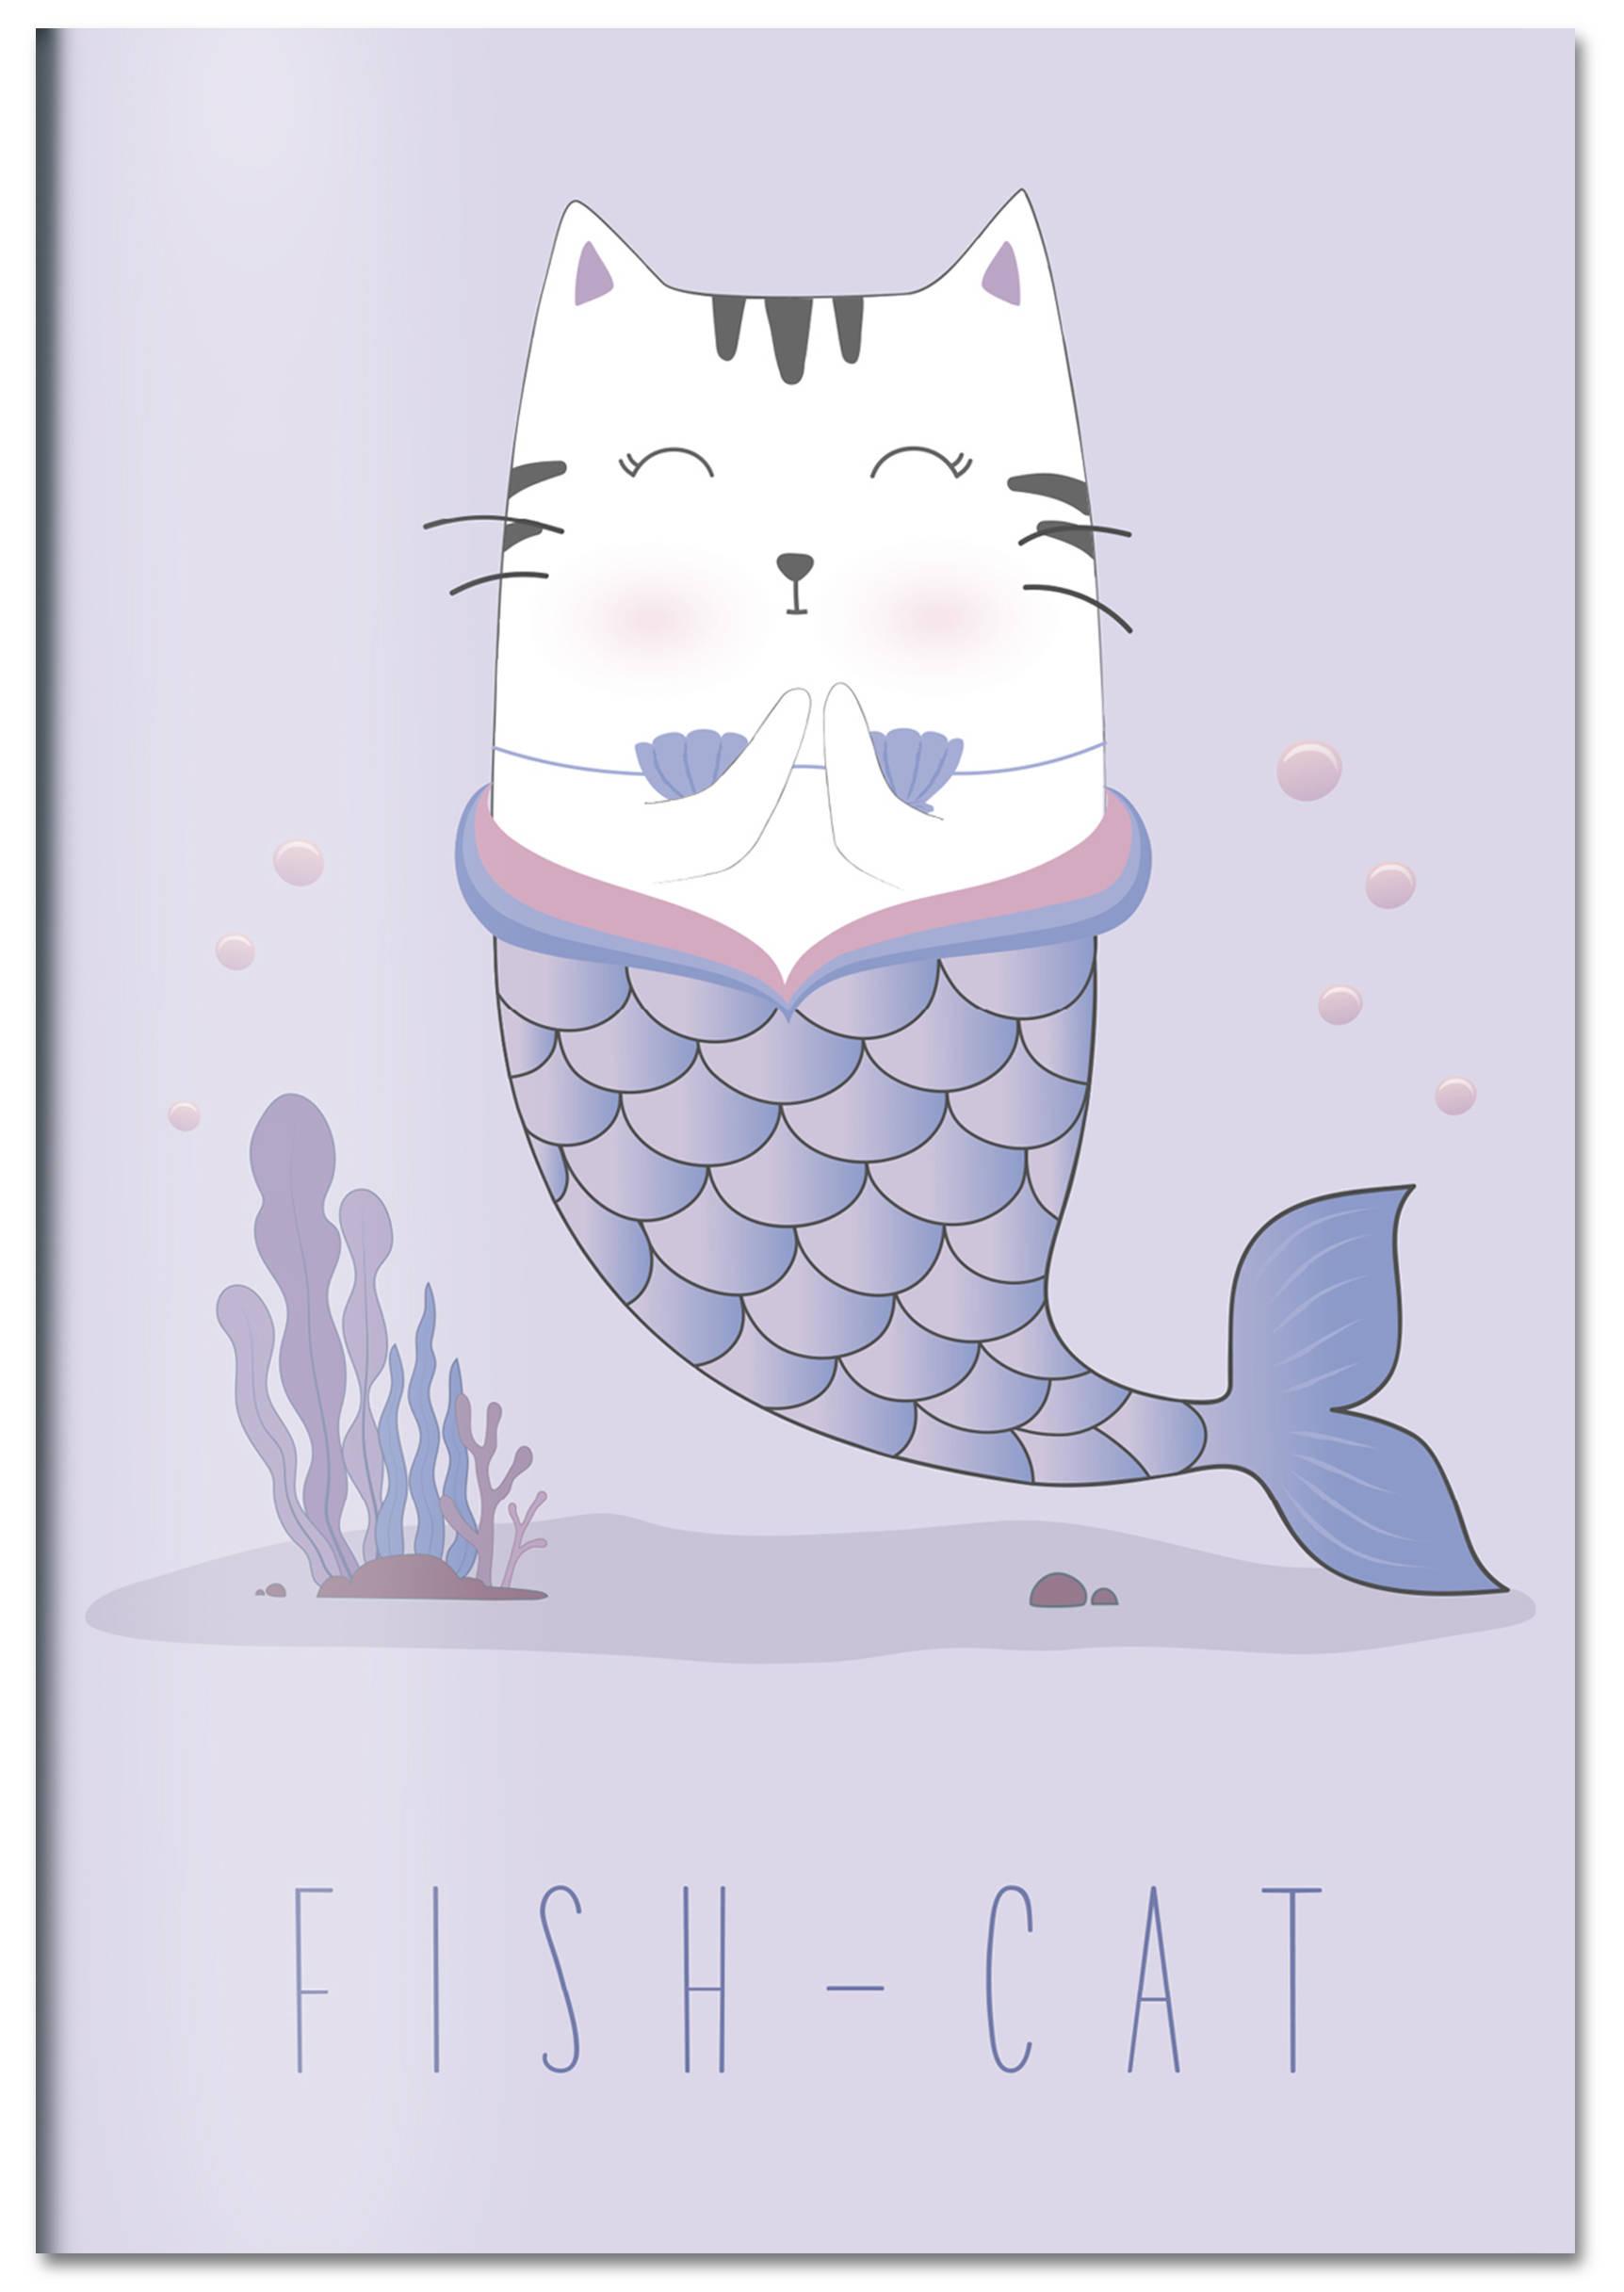 Fish-cat. Тетрадь общая (А5, 48 л., УФ-лак, накидка 4 п. полноцвет)